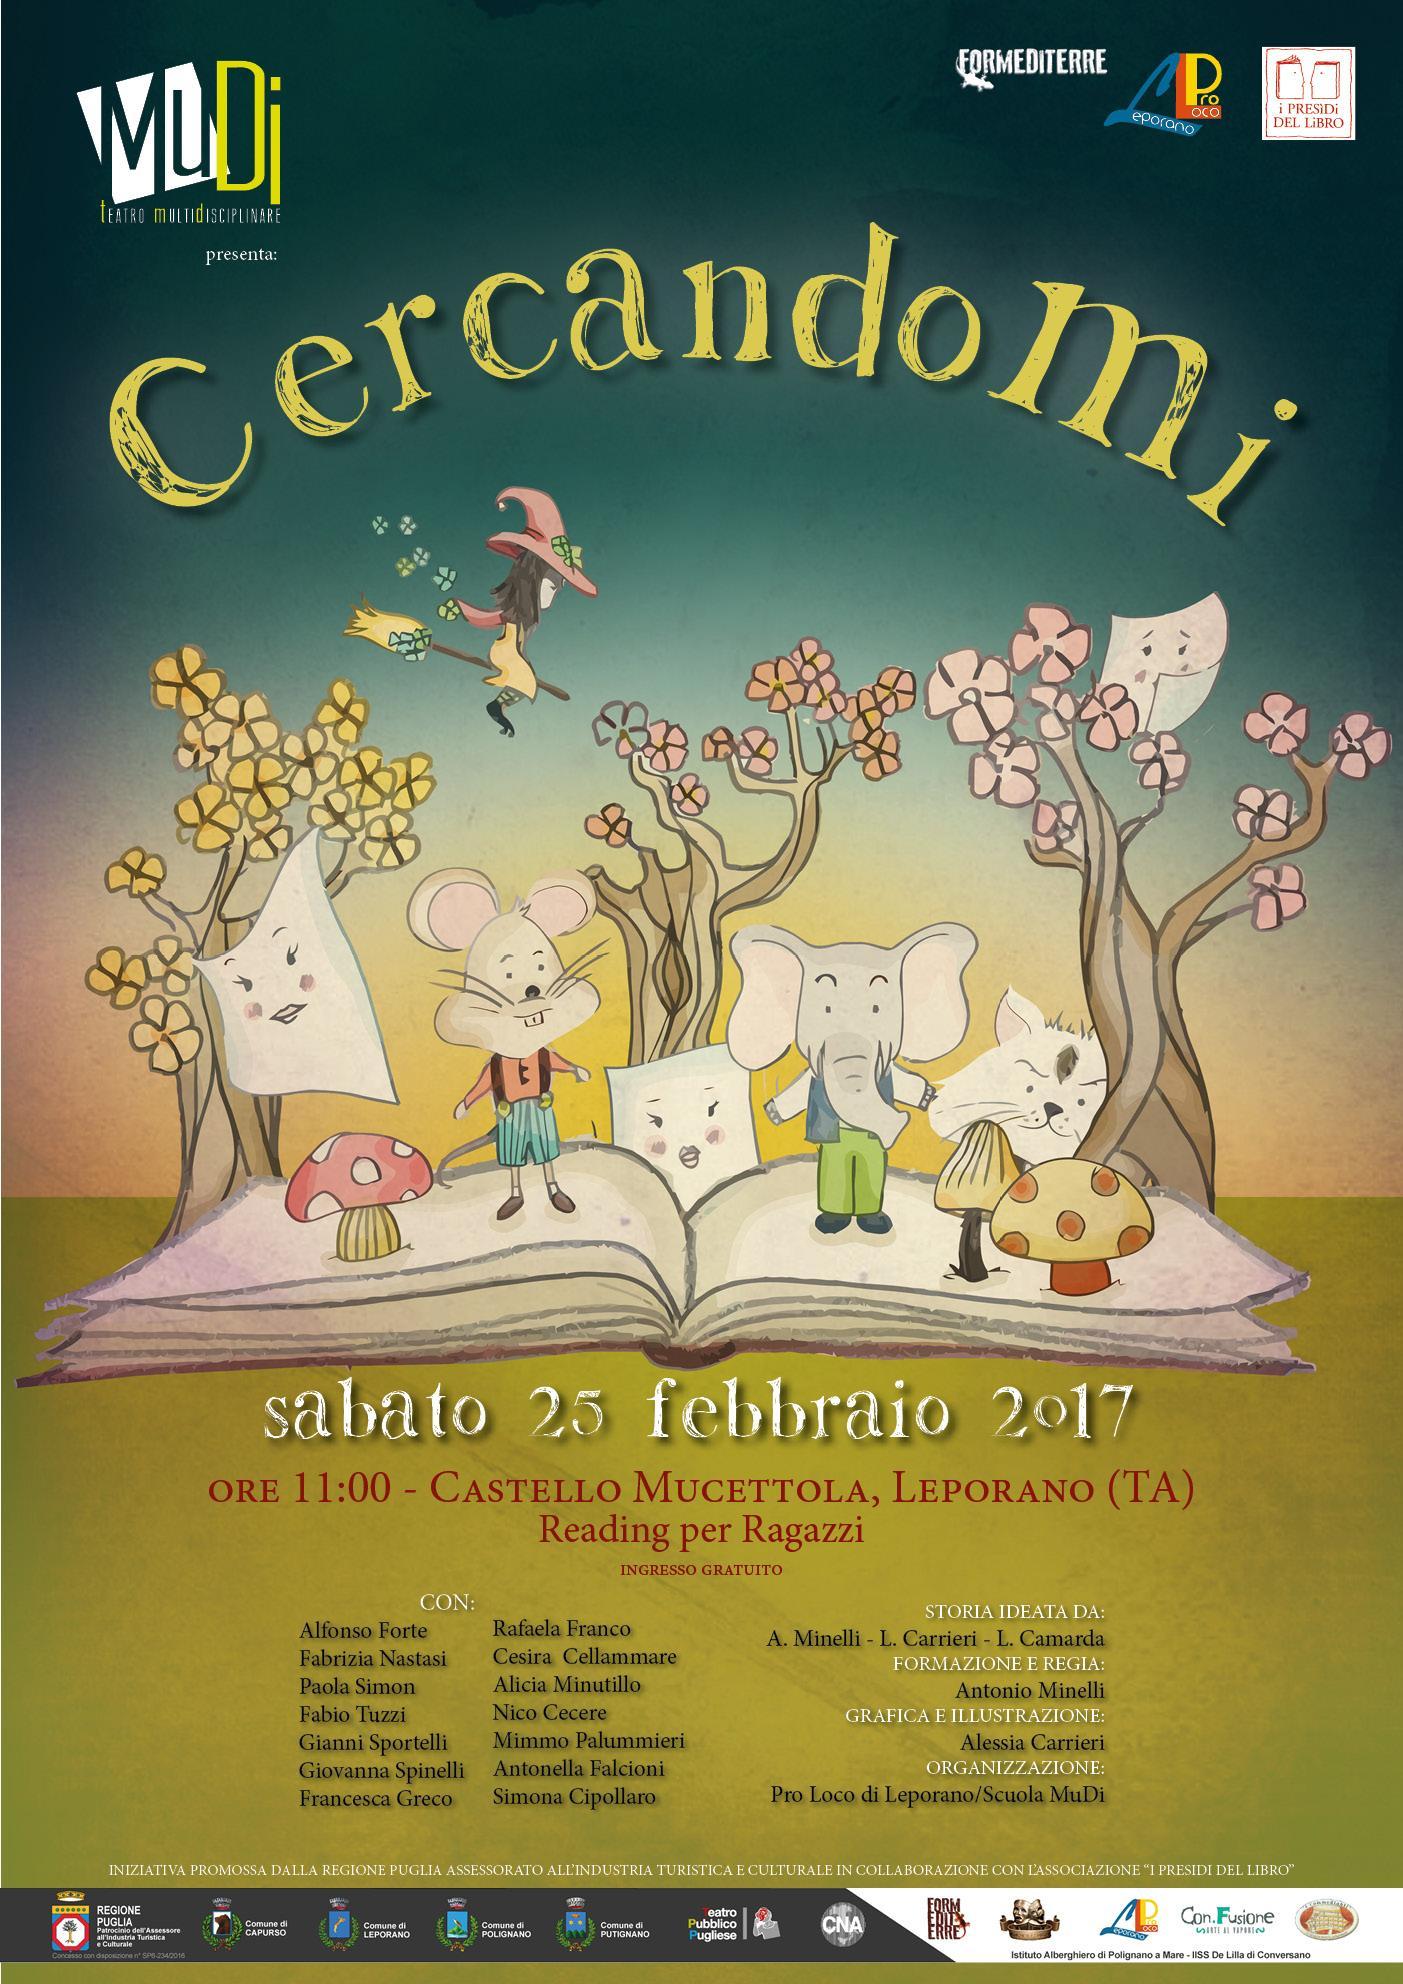 LOCANDINA CERCANDOMI_MuDi Leporano_web1 (2)